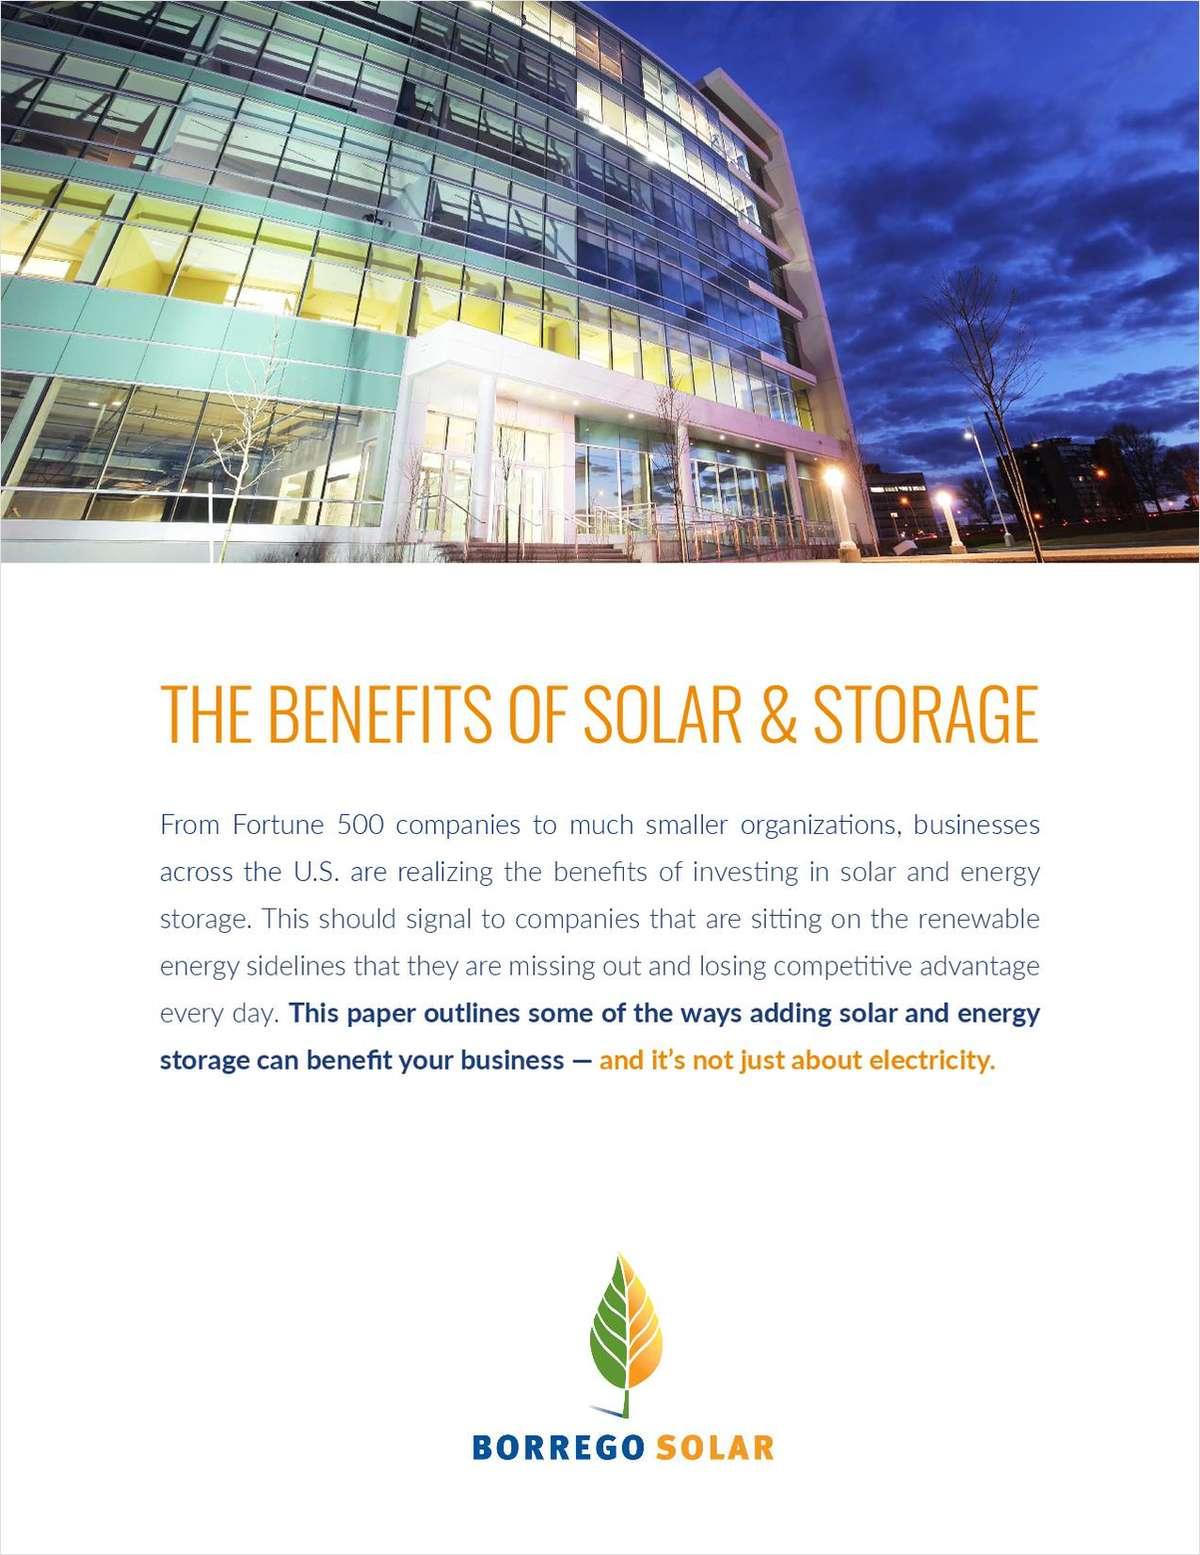 The Benefits of Solar & Energy Storage?